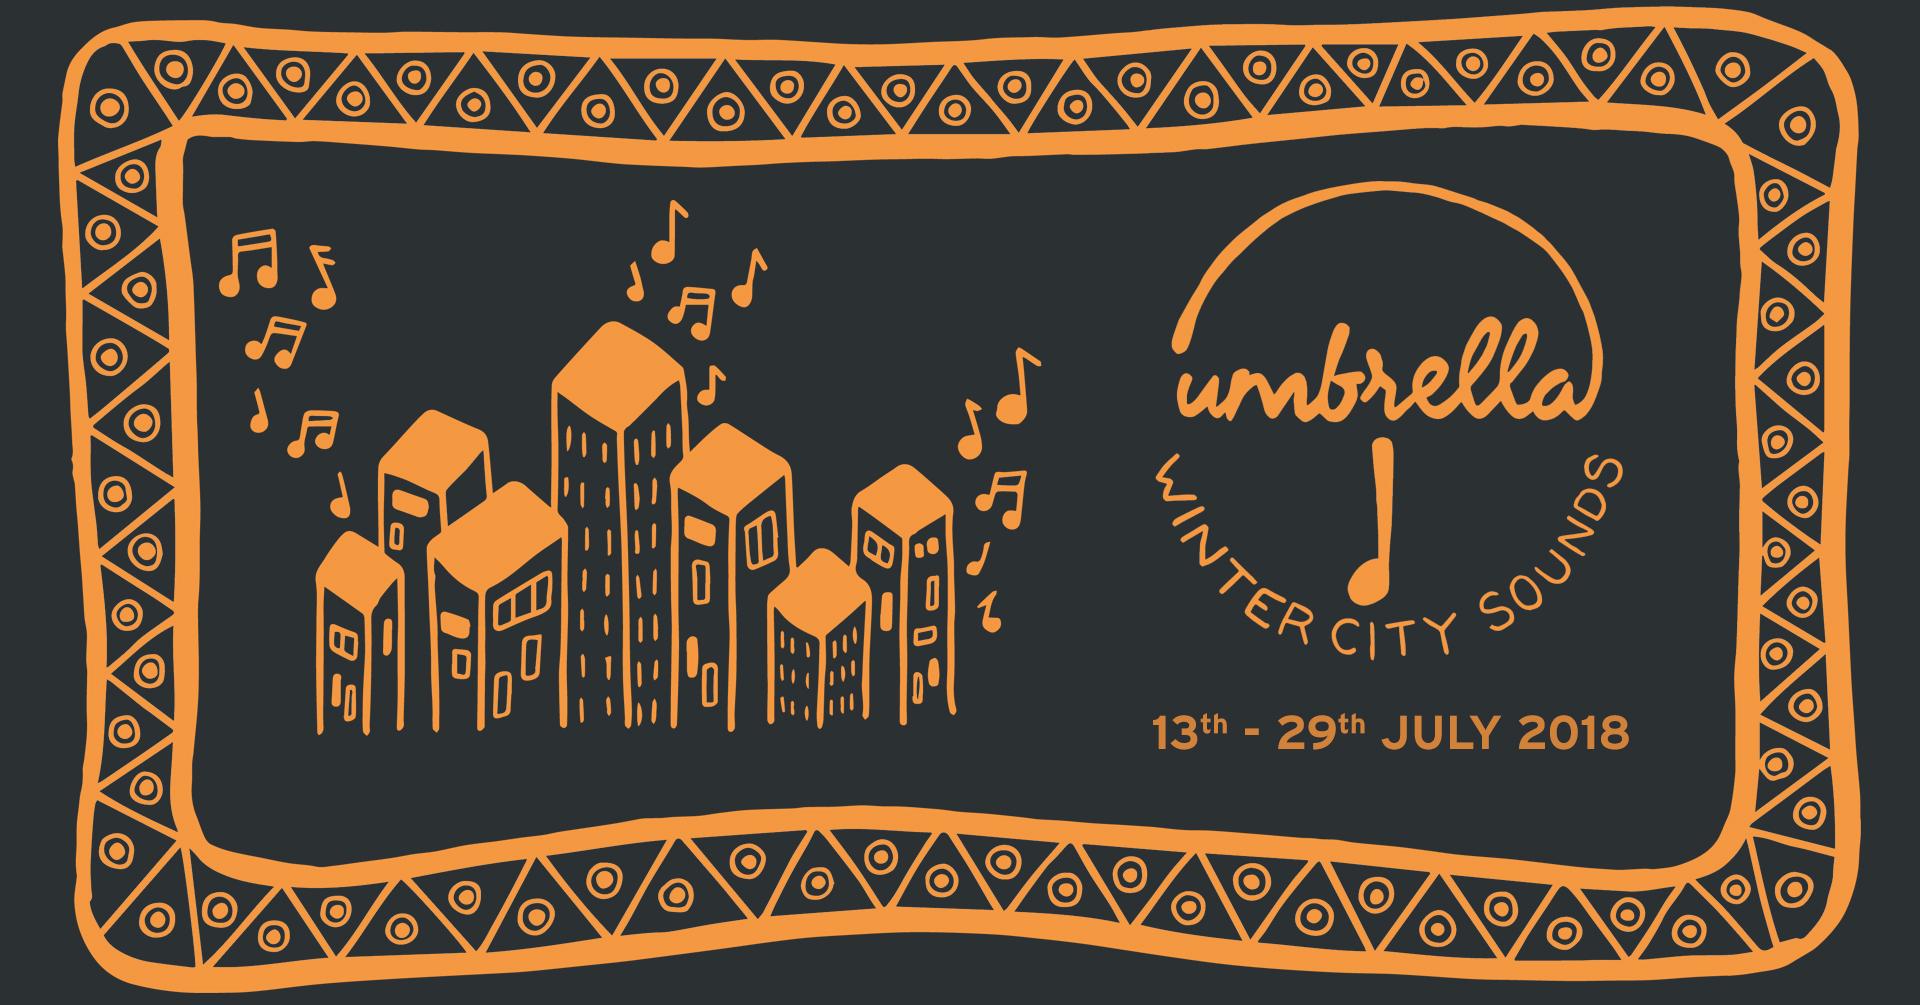 Umbrella: Winter City Sounds Program is OUT!